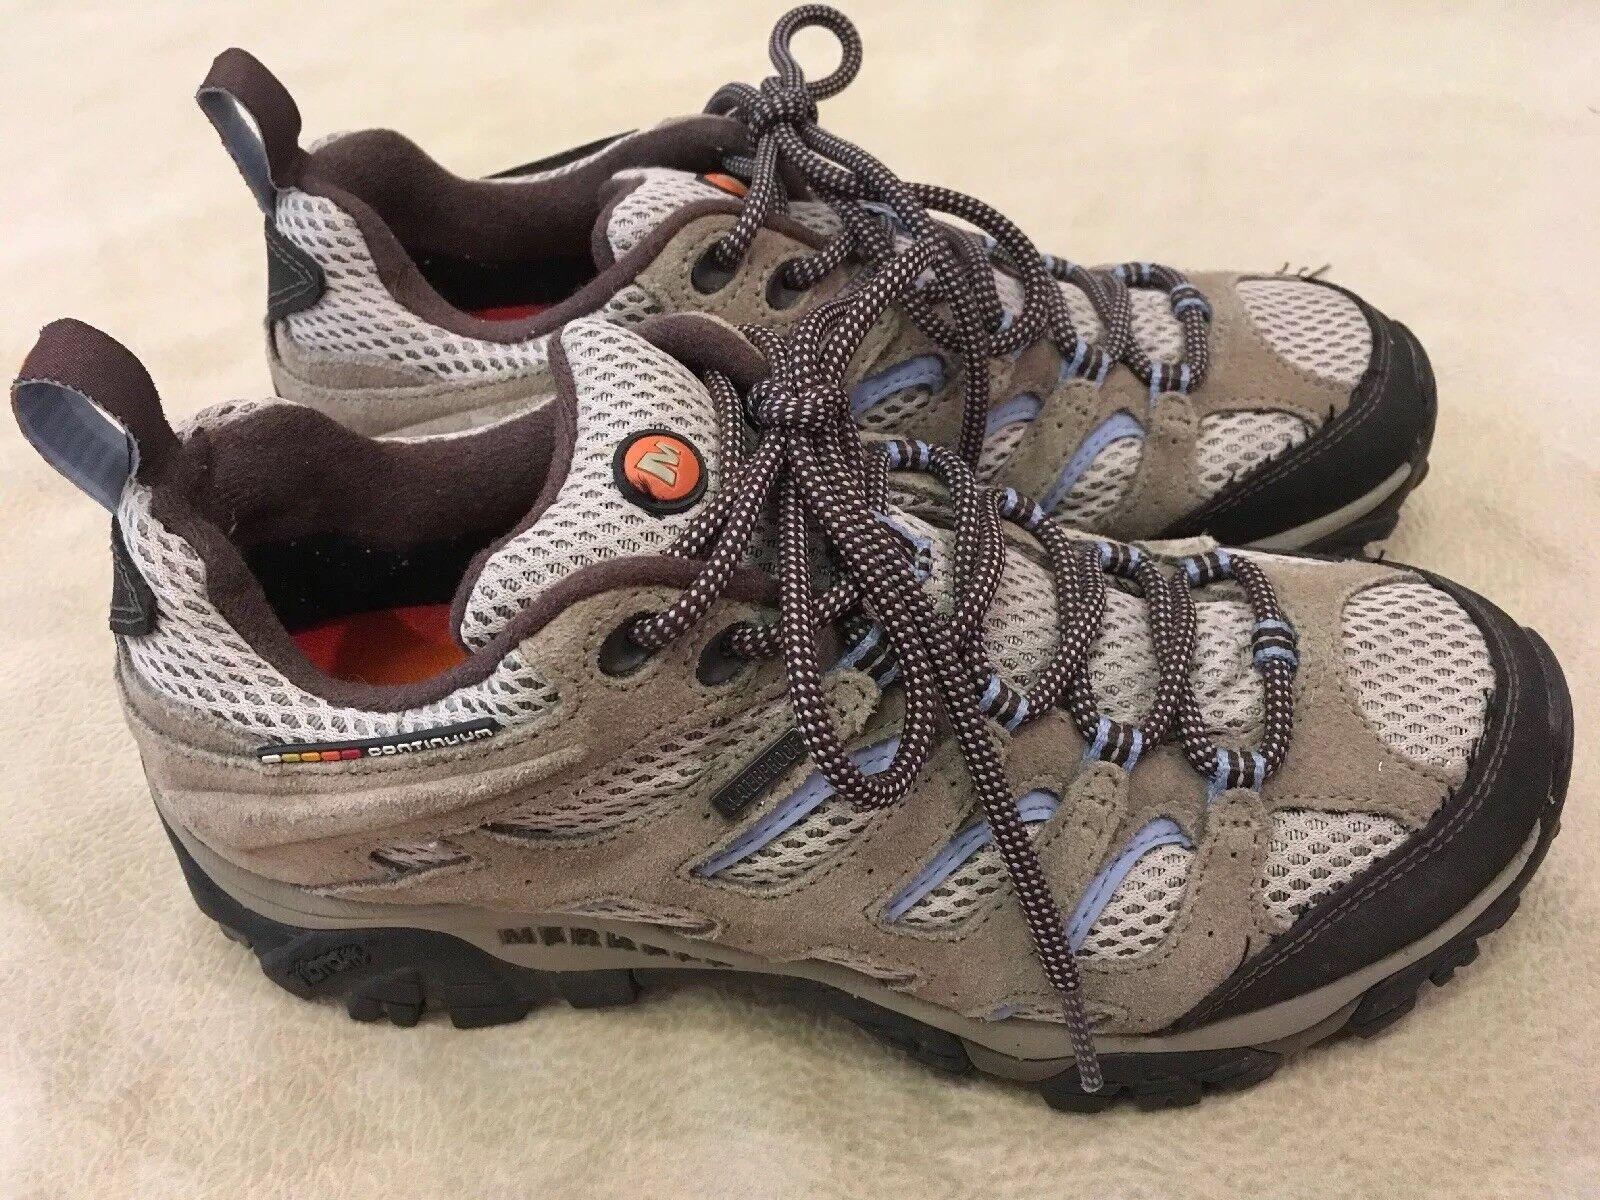 Merrell 8.5 Womens Trail shoes Sneakers Continuum Air Cushion Q Form Ortholite